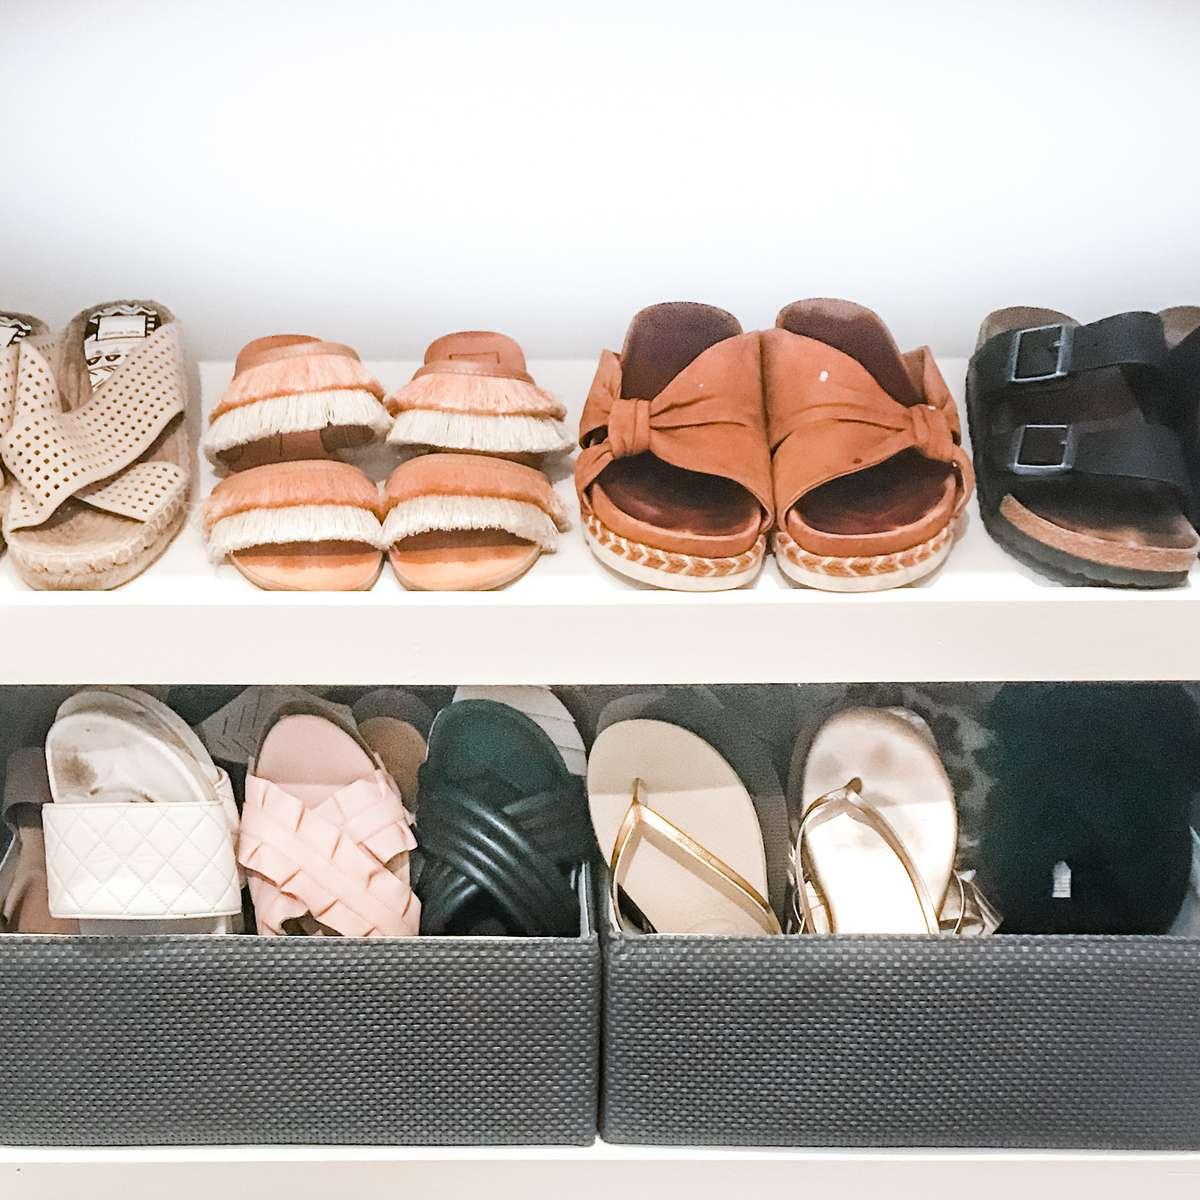 Sandals in baskets